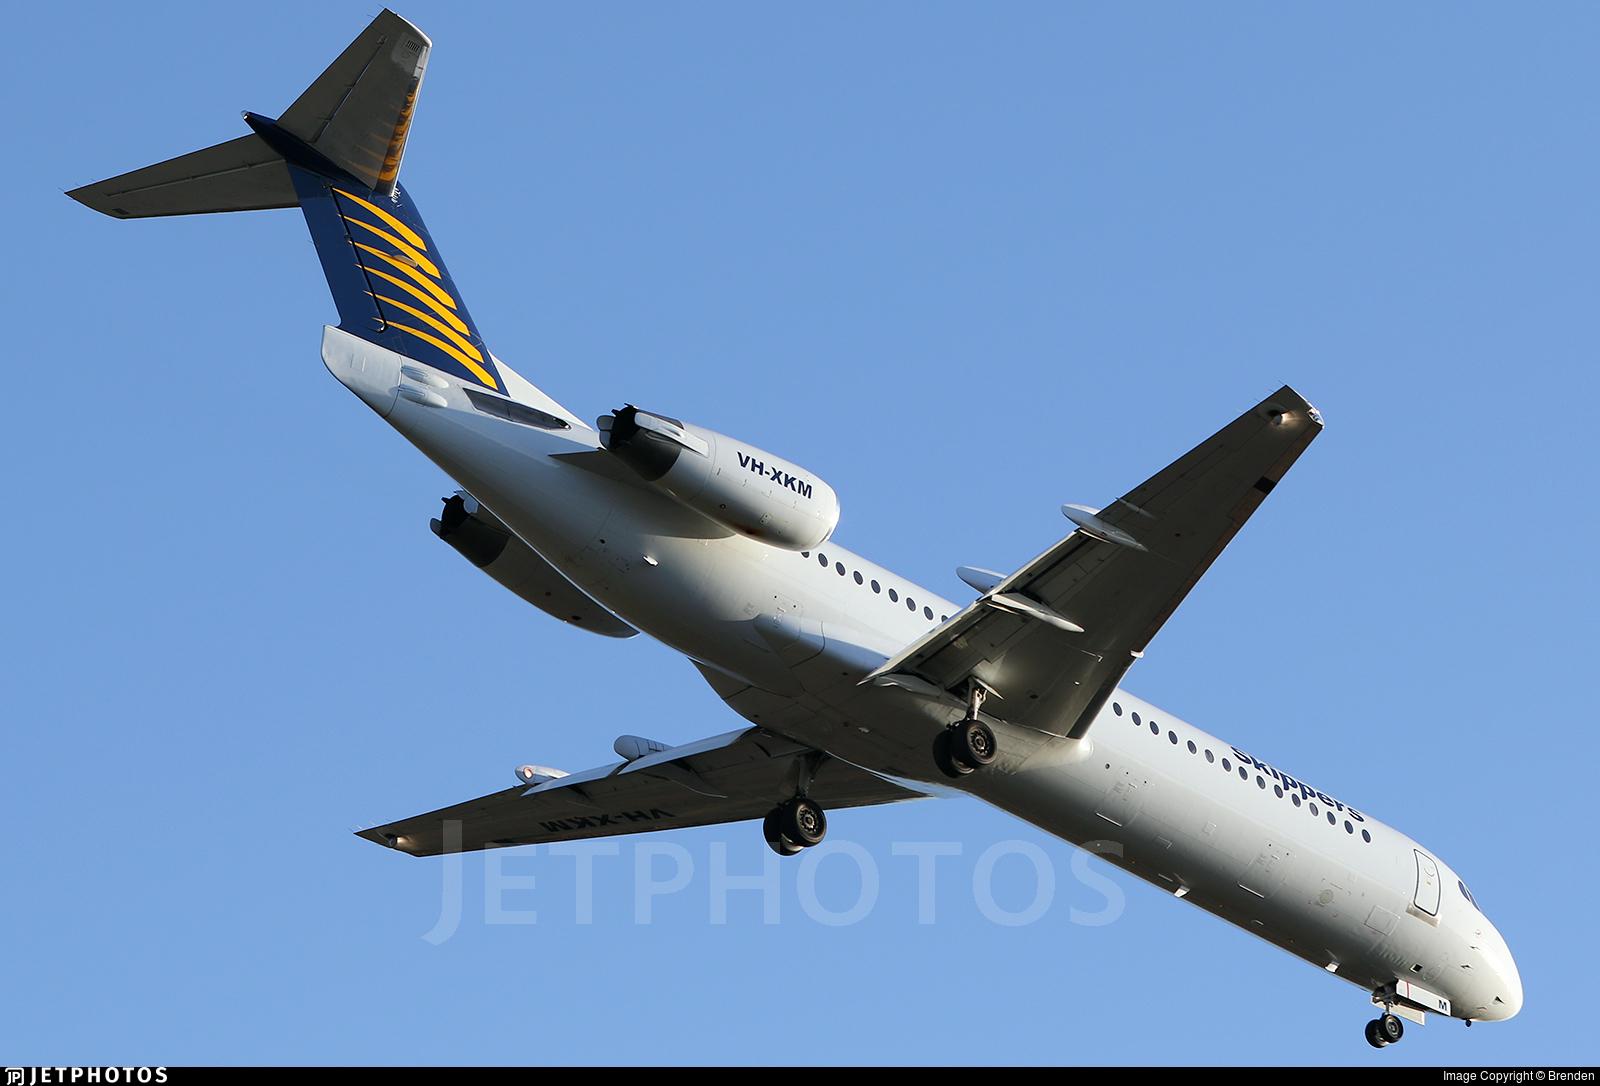 VH-XKM - Fokker 100 - Skippers Aviation